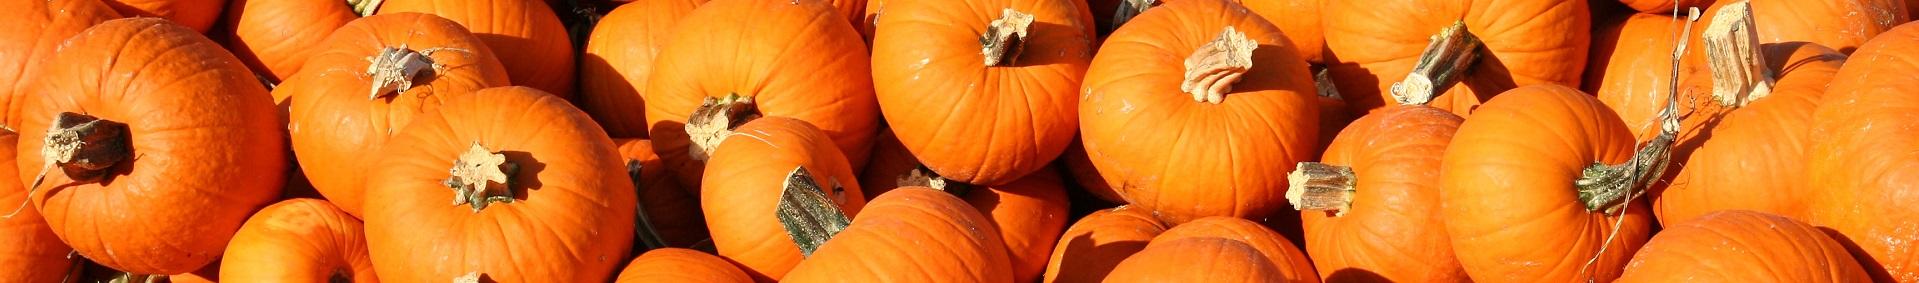 https://cestovnakancelariadaka.sk/files/product/indiana-us30-pumpkins.jpg